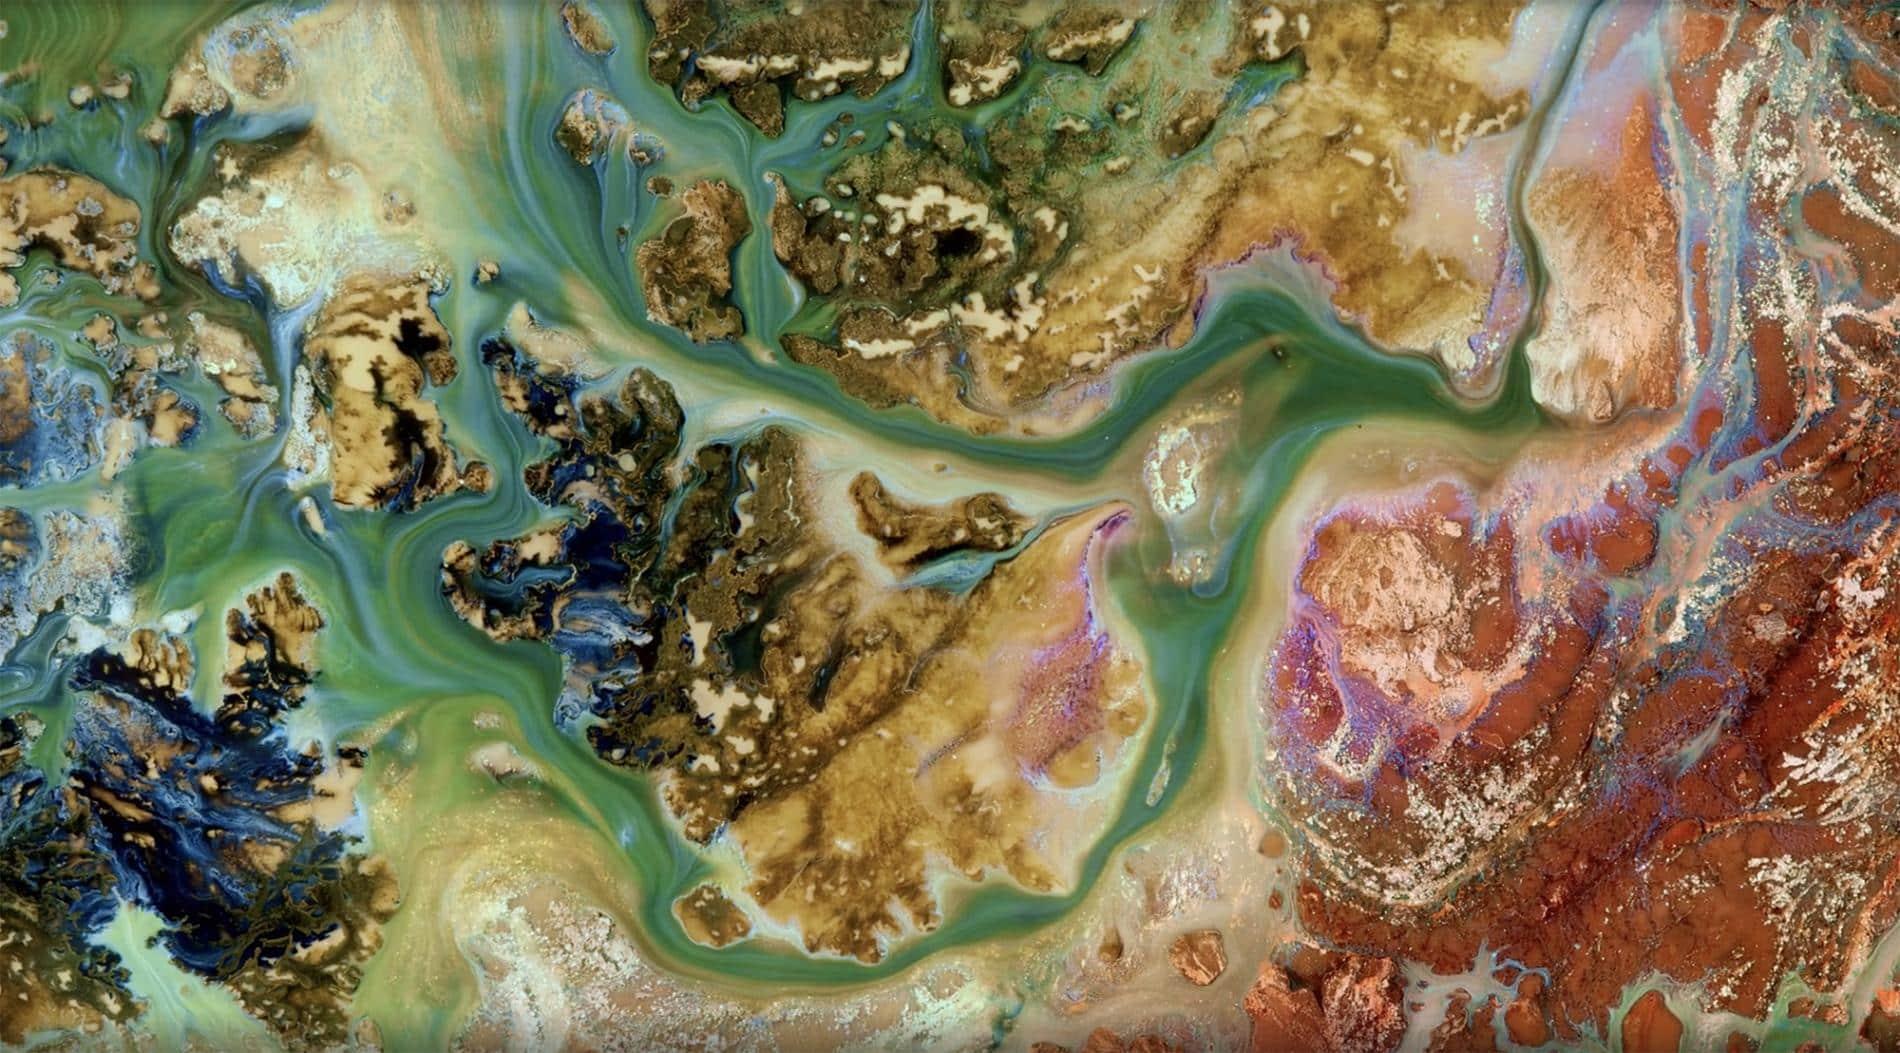 satellike de giuli imagen